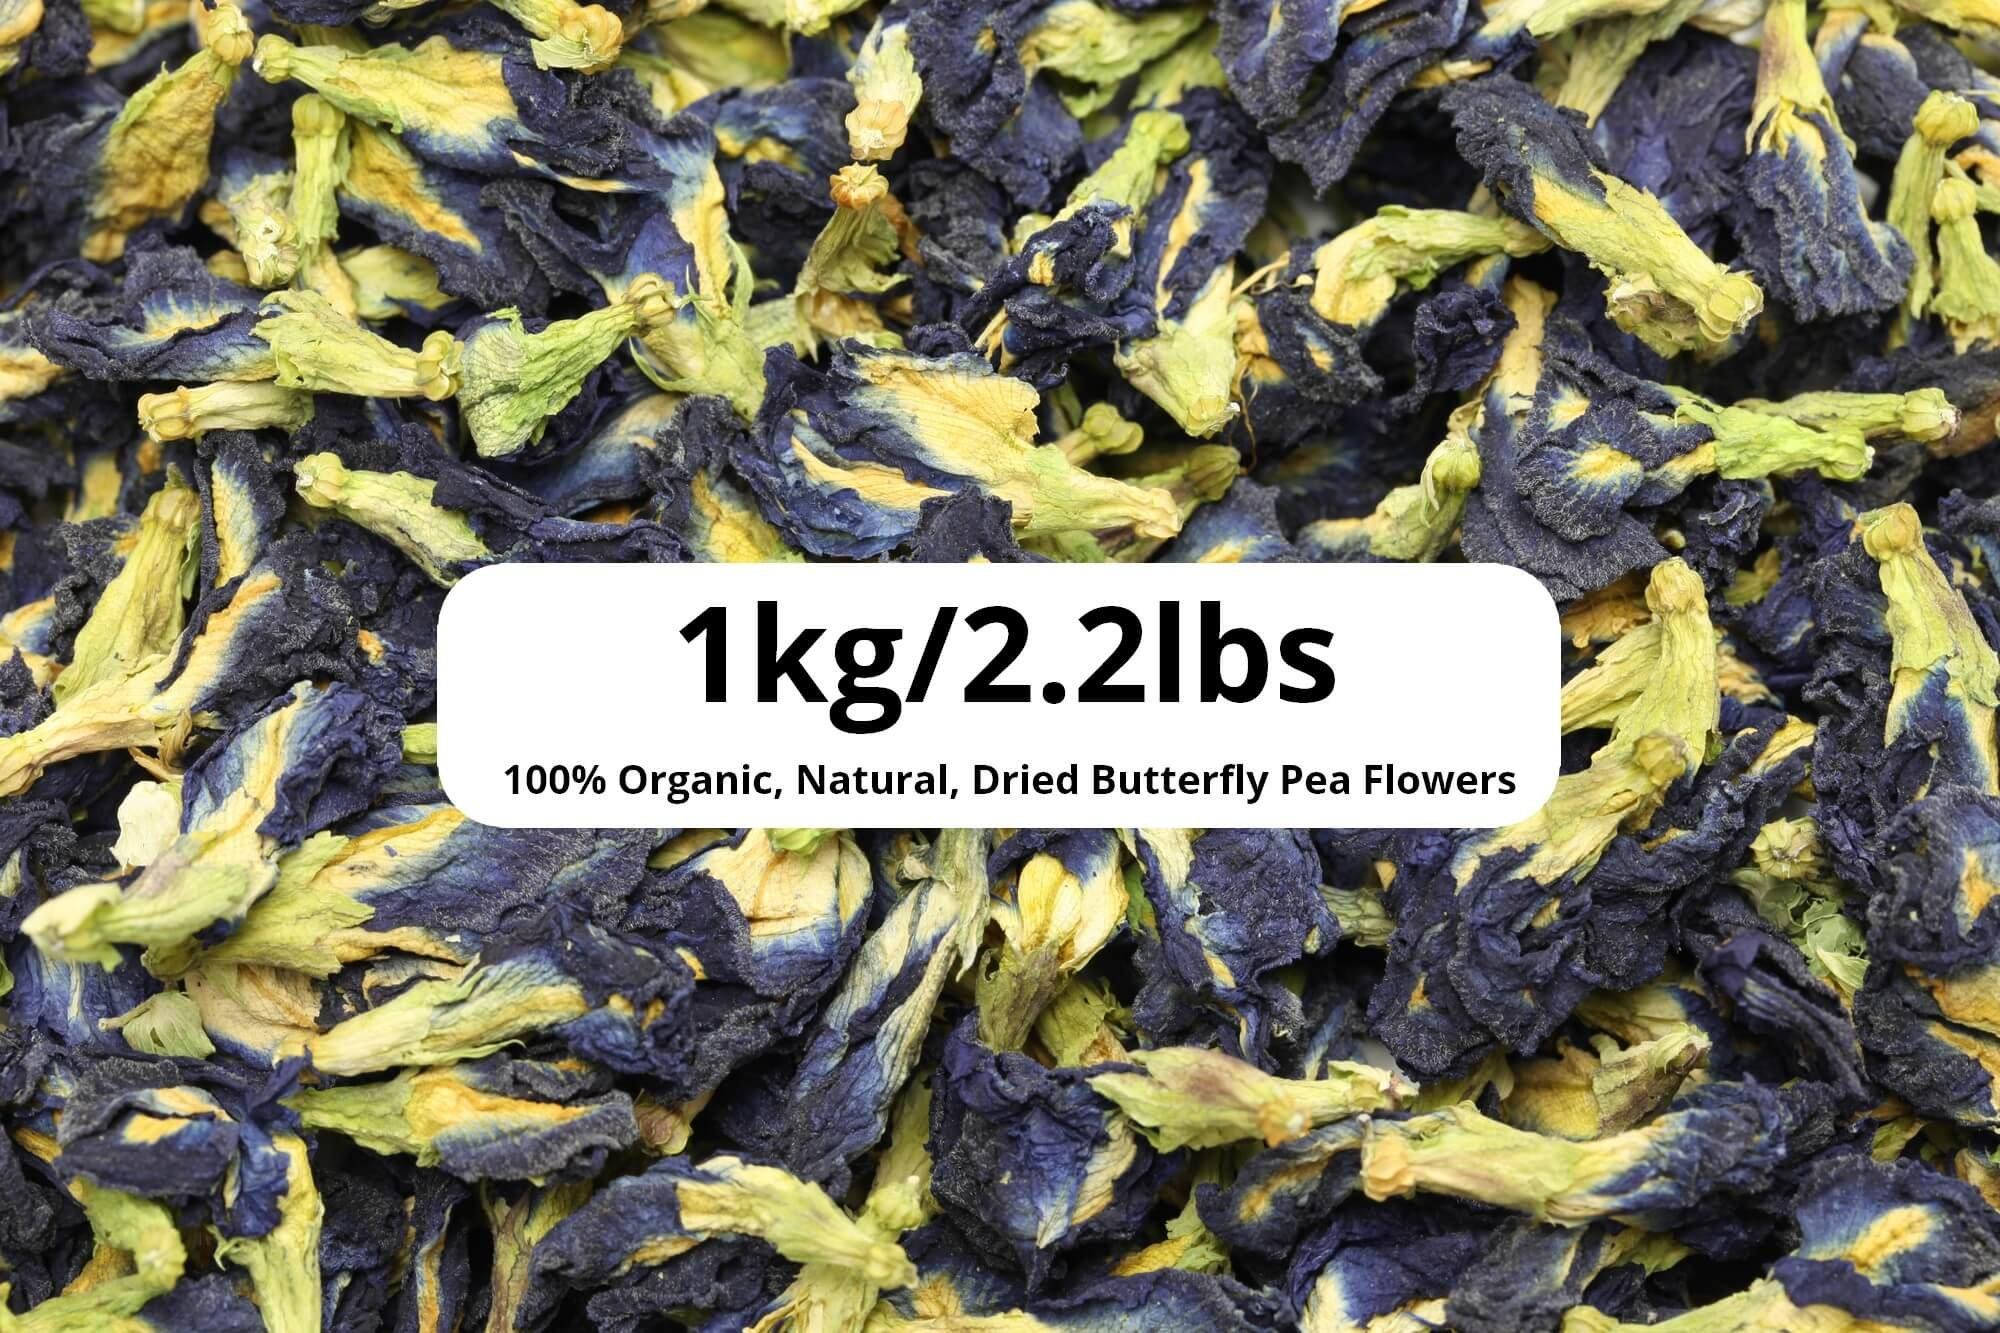 1kg/2.2lb Dried Butterfly Pea Flowers – Wholesale